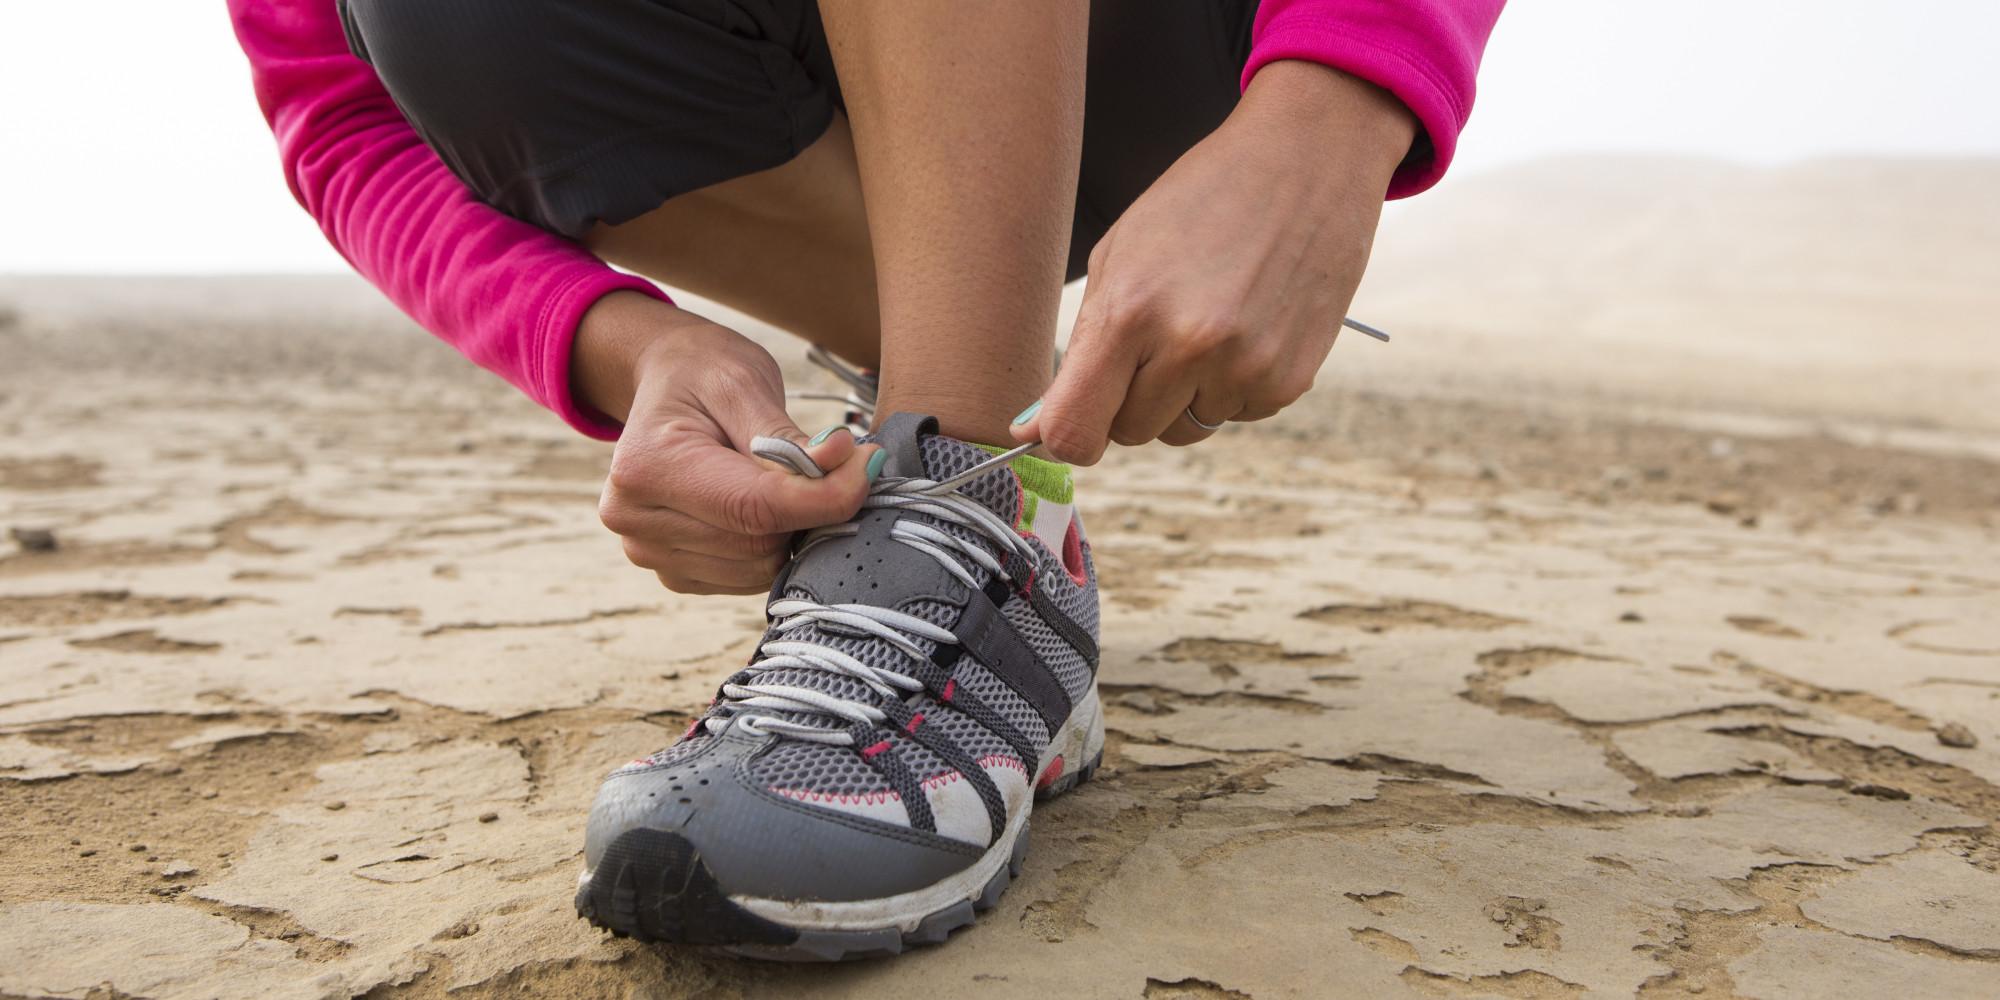 Cross-Training Shoes For Women